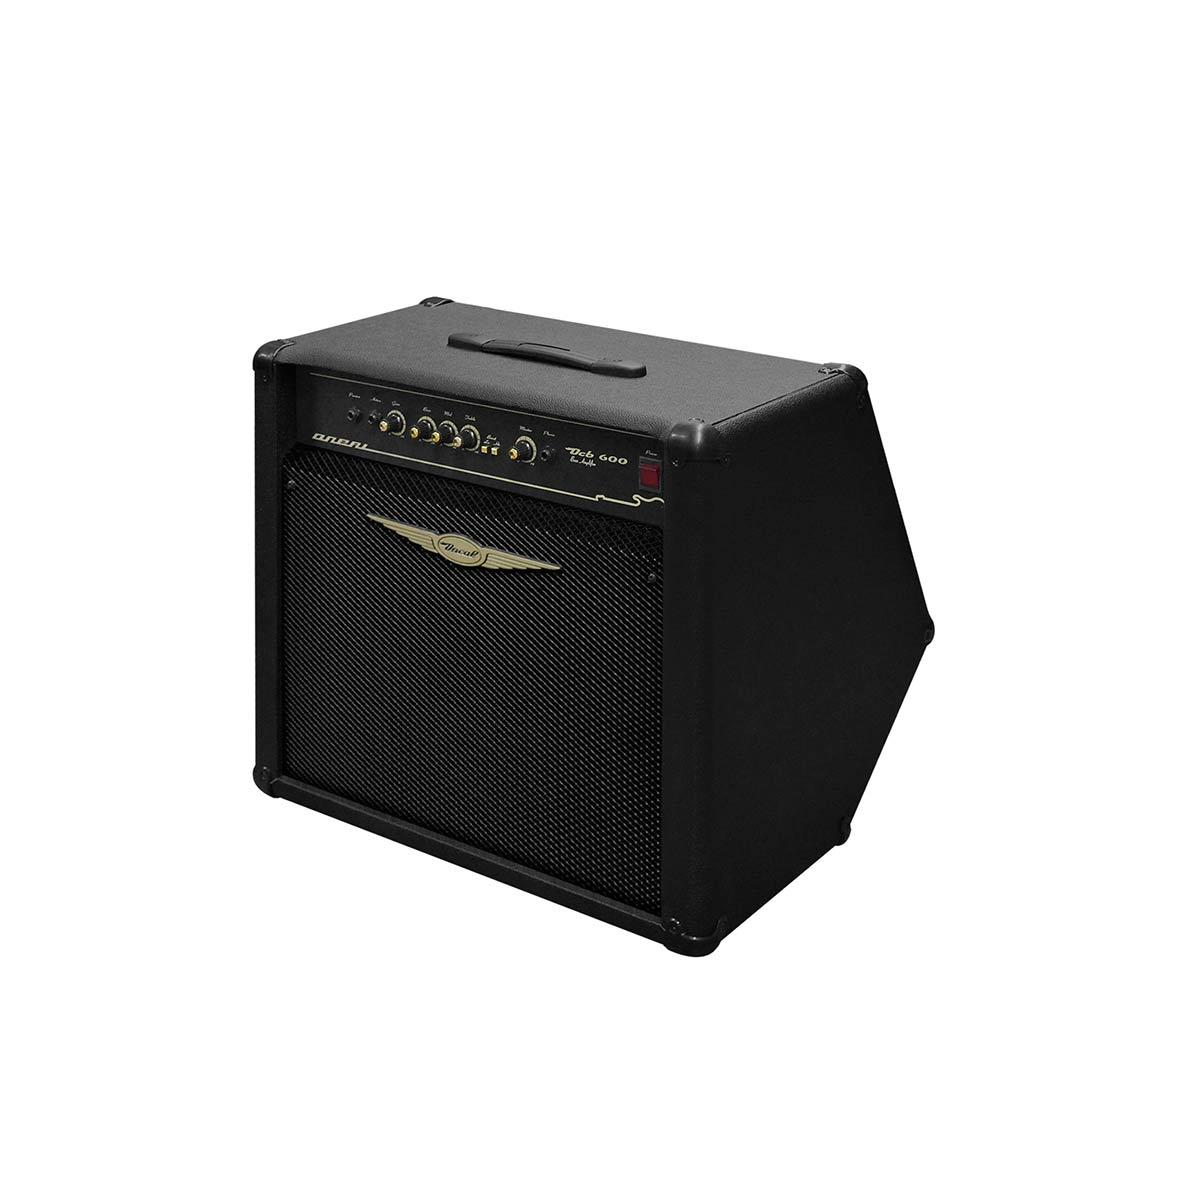 OCB600 - Cubo Amplificador p/ Contrabaixo 200W OCB 600 - Oneal